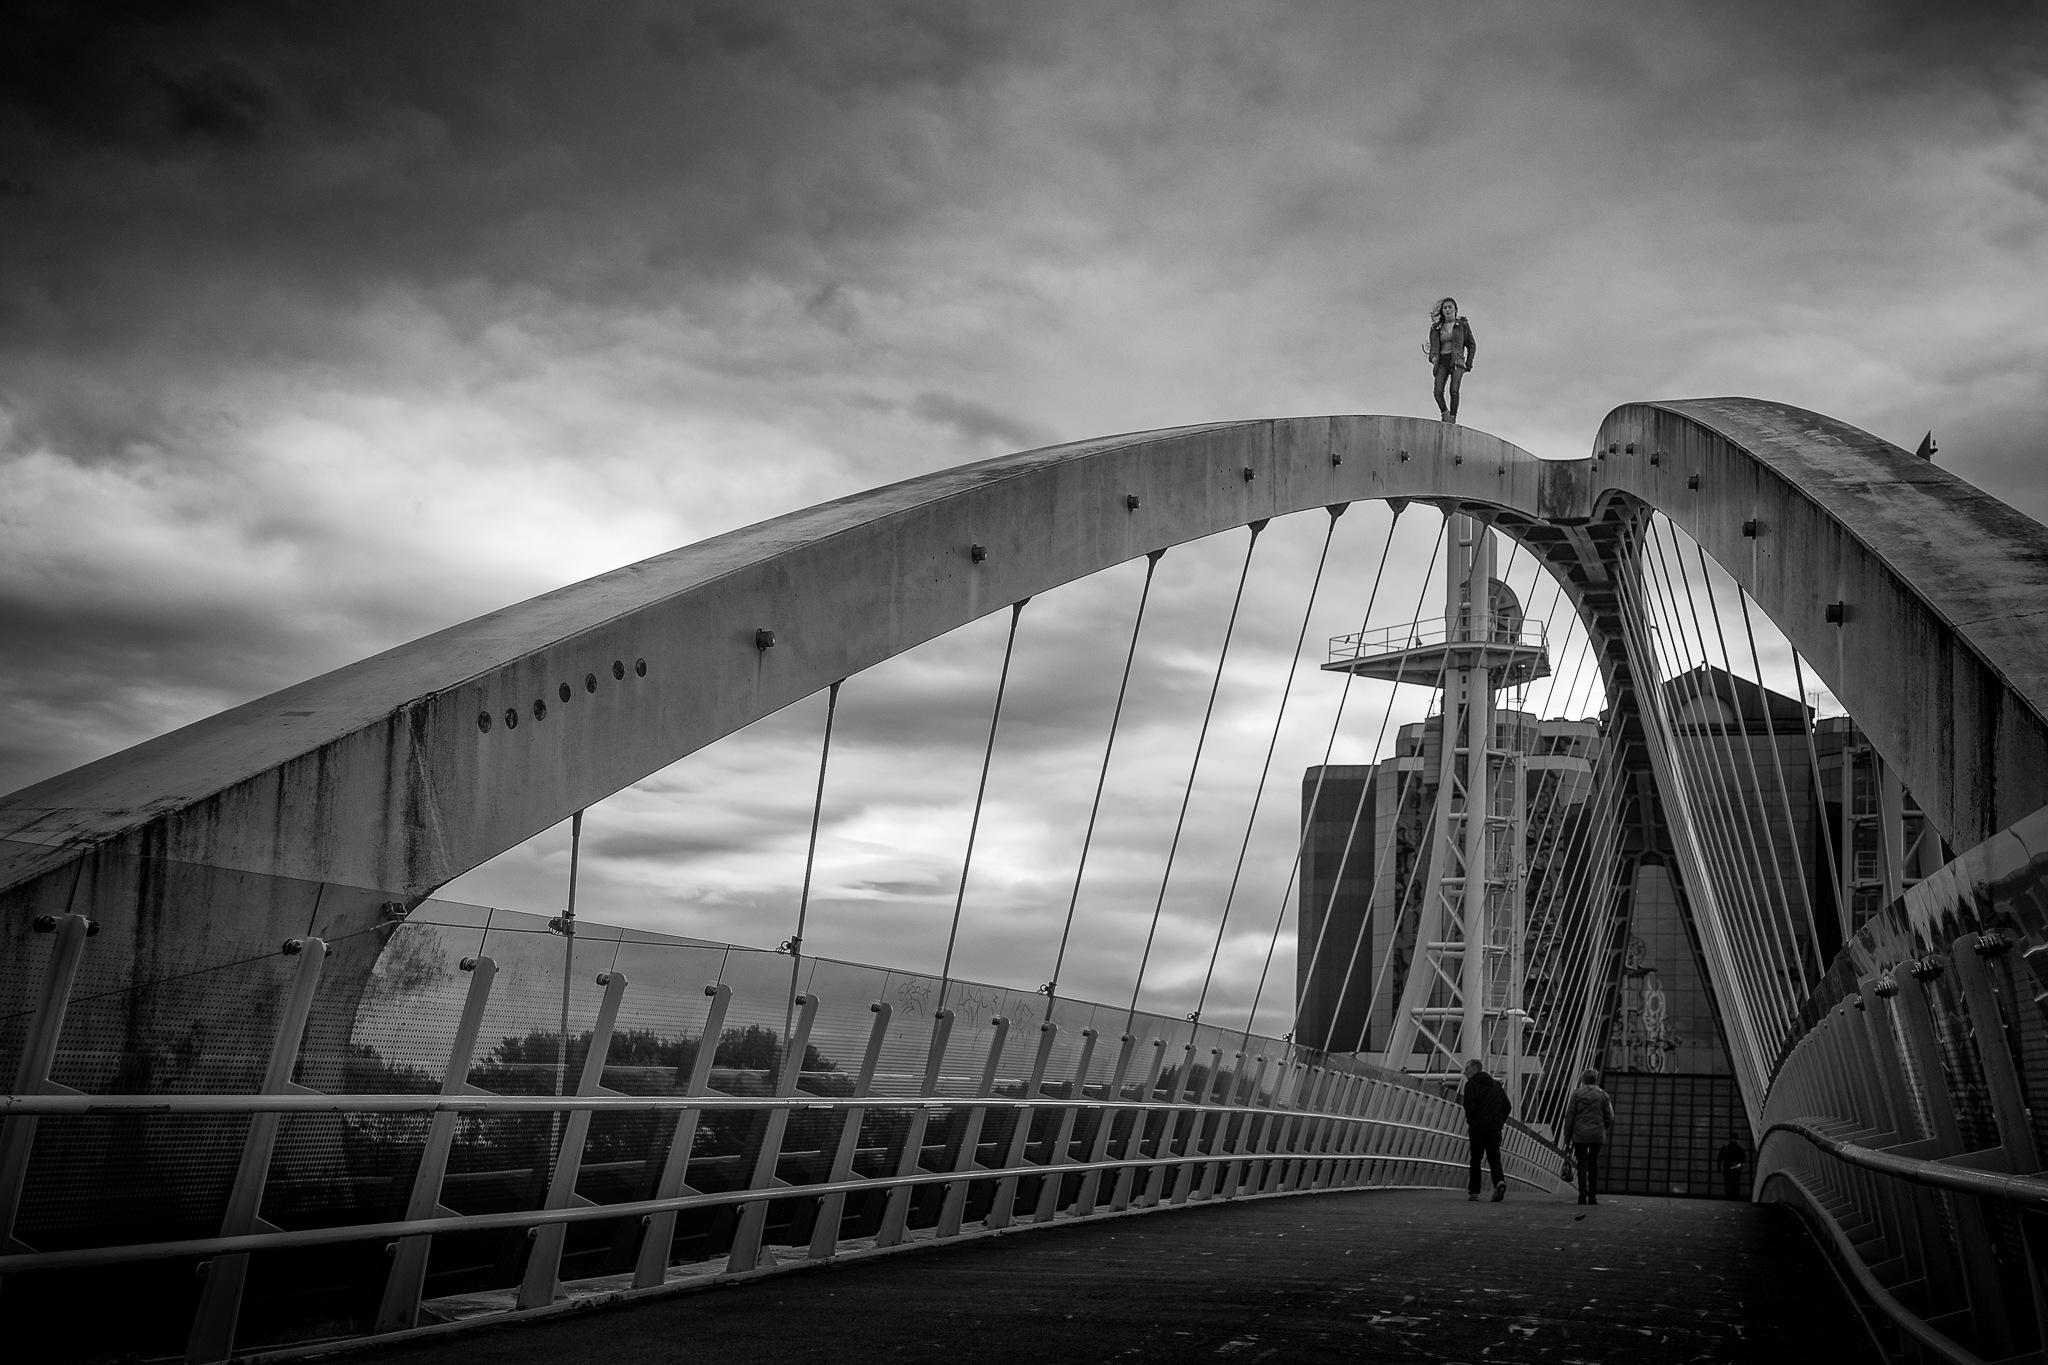 Millenium Bridge by IWCharters